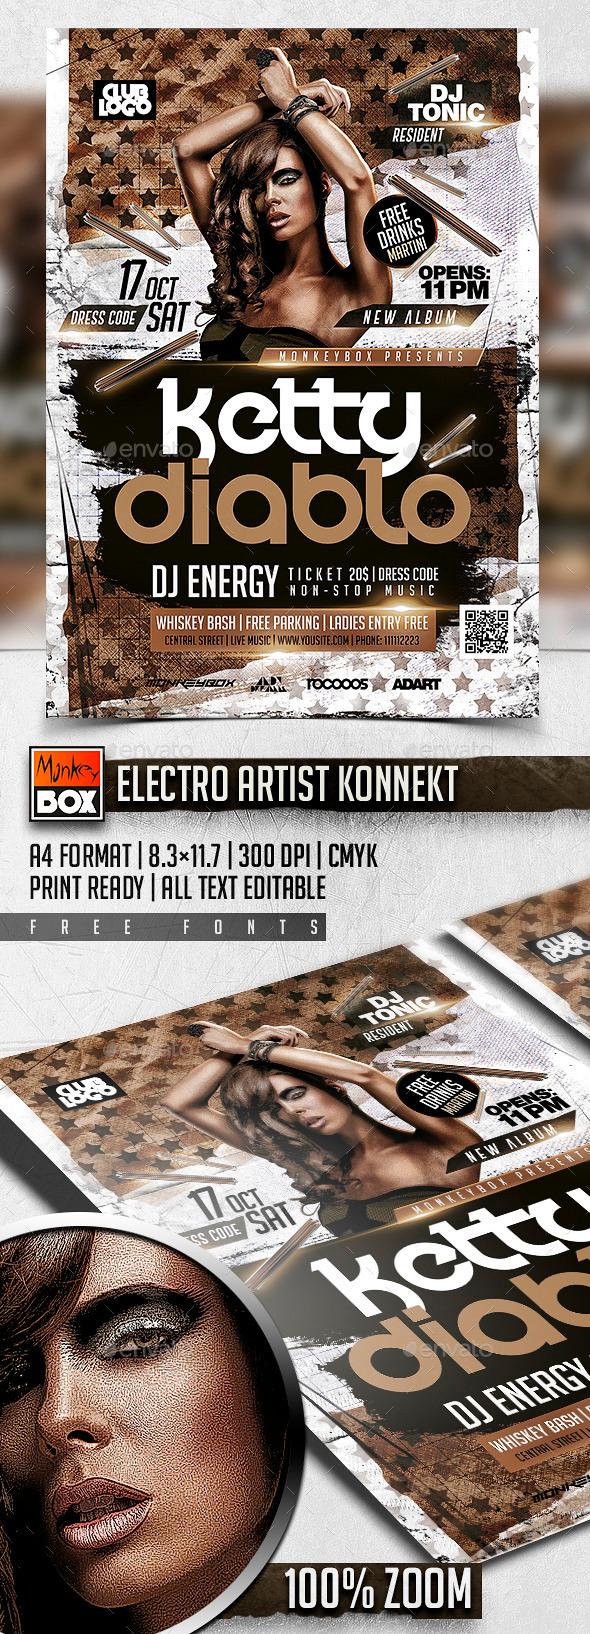 Electro Artist Konnekt - Clubs & Parties Events